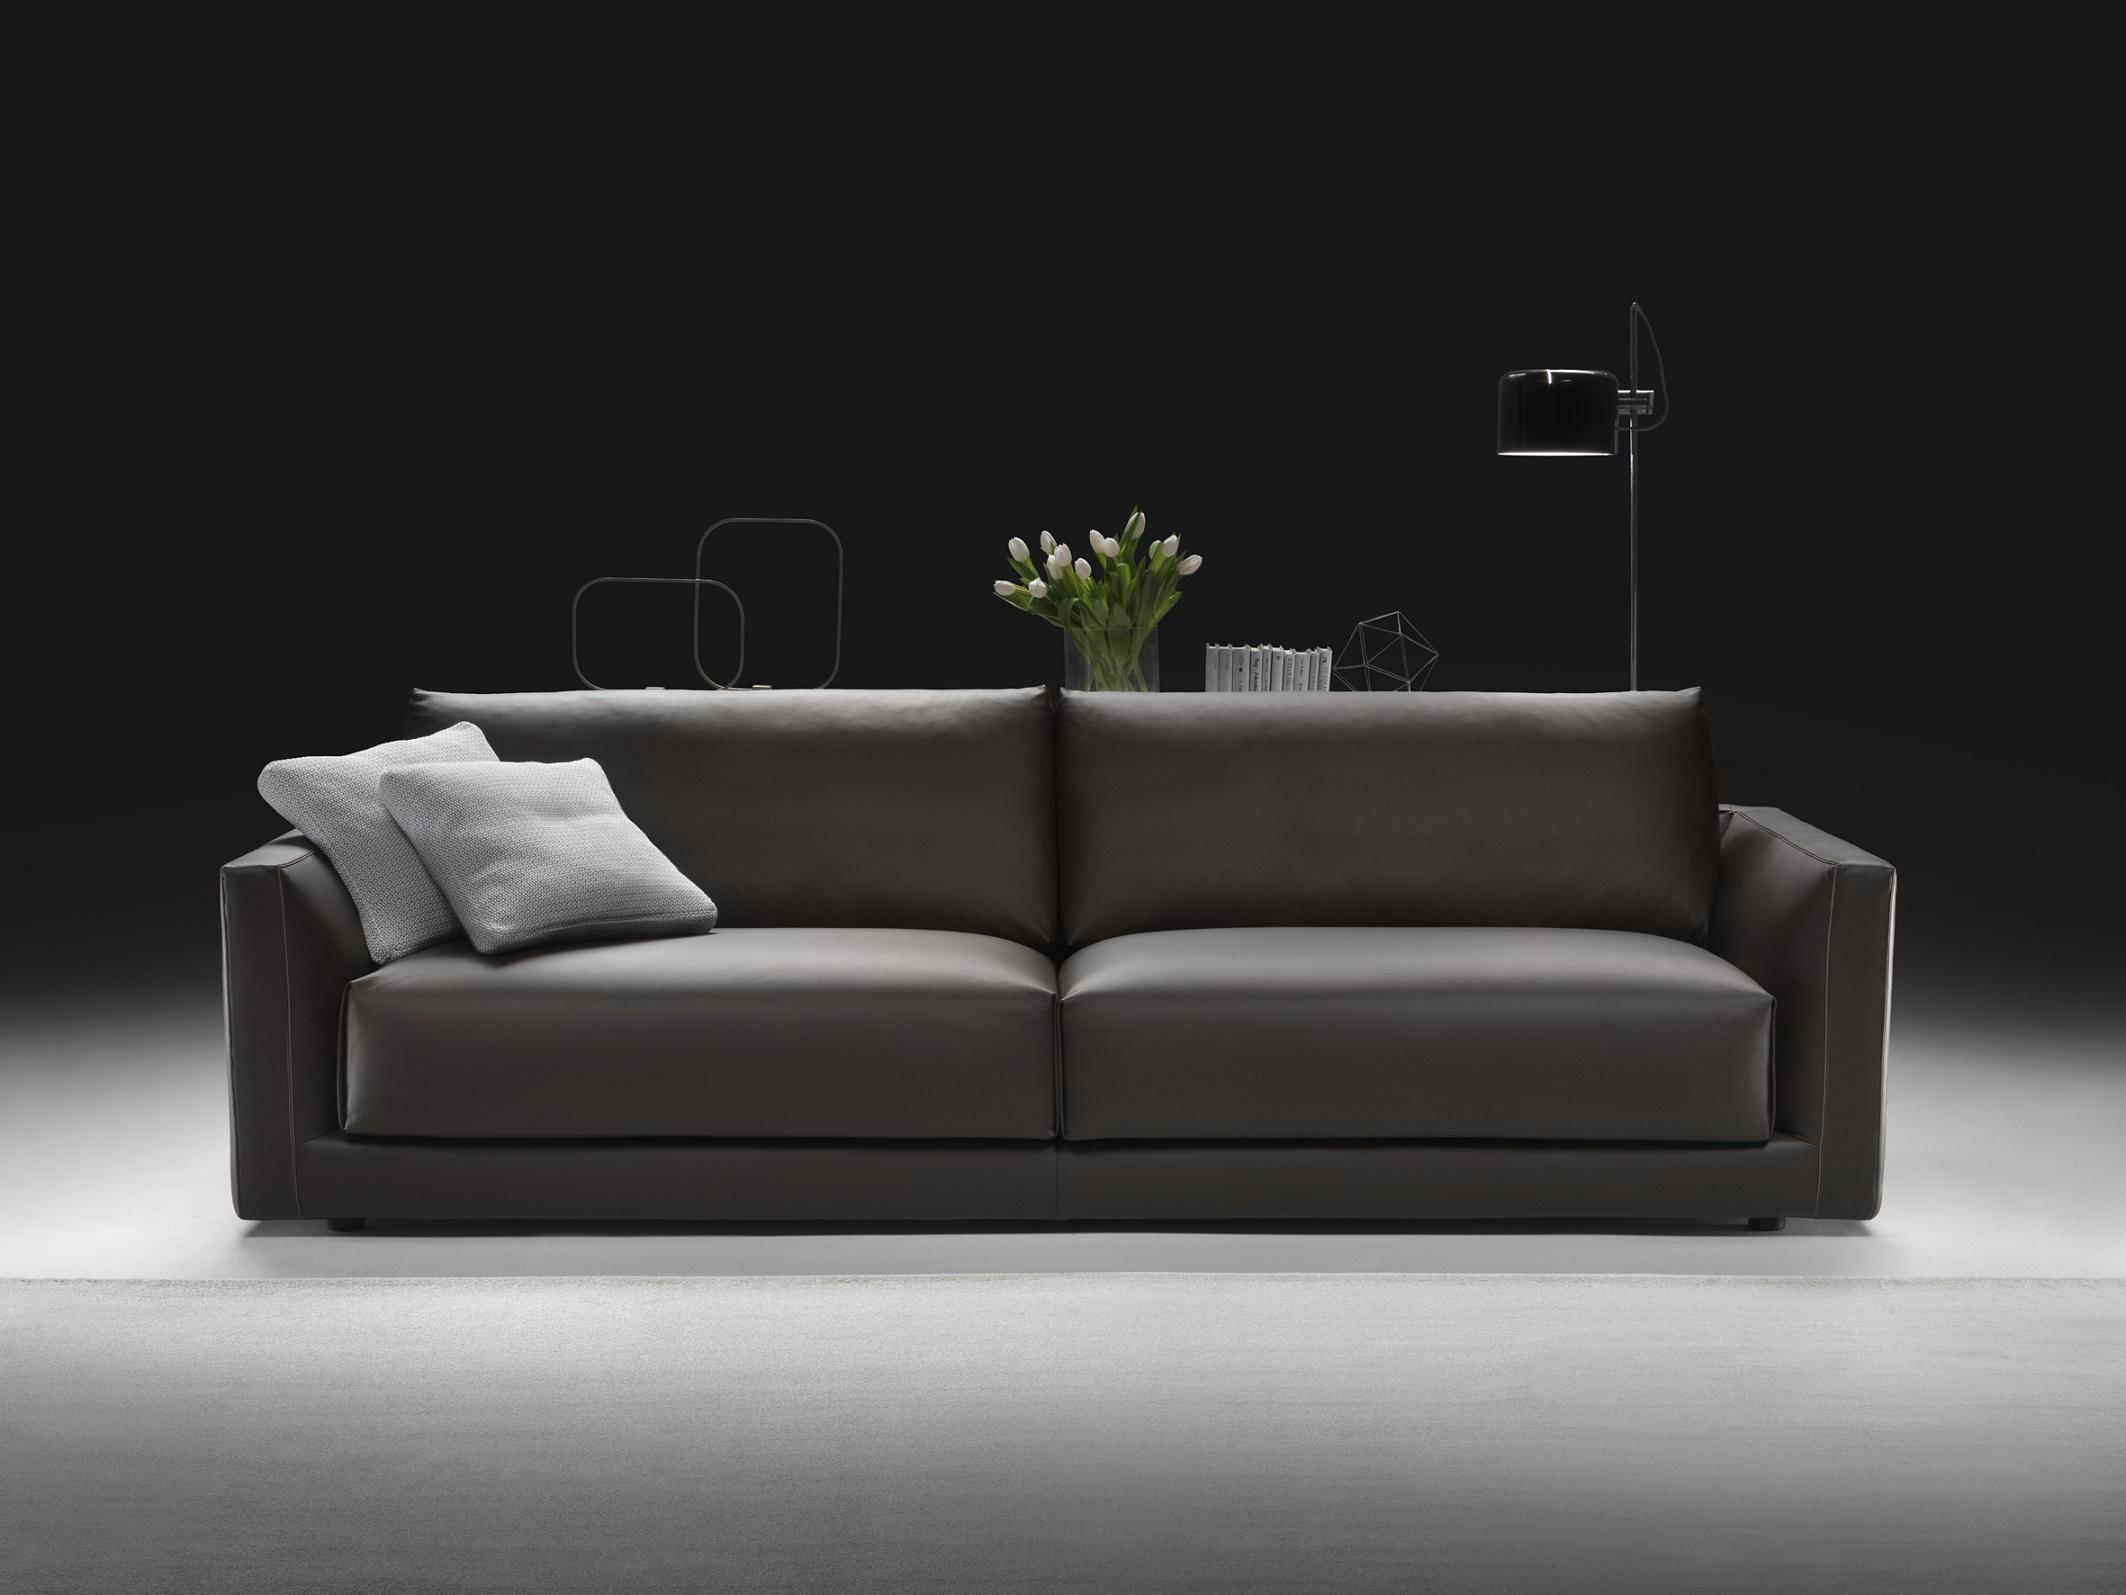 divano pelle soma made in italy divano moderno